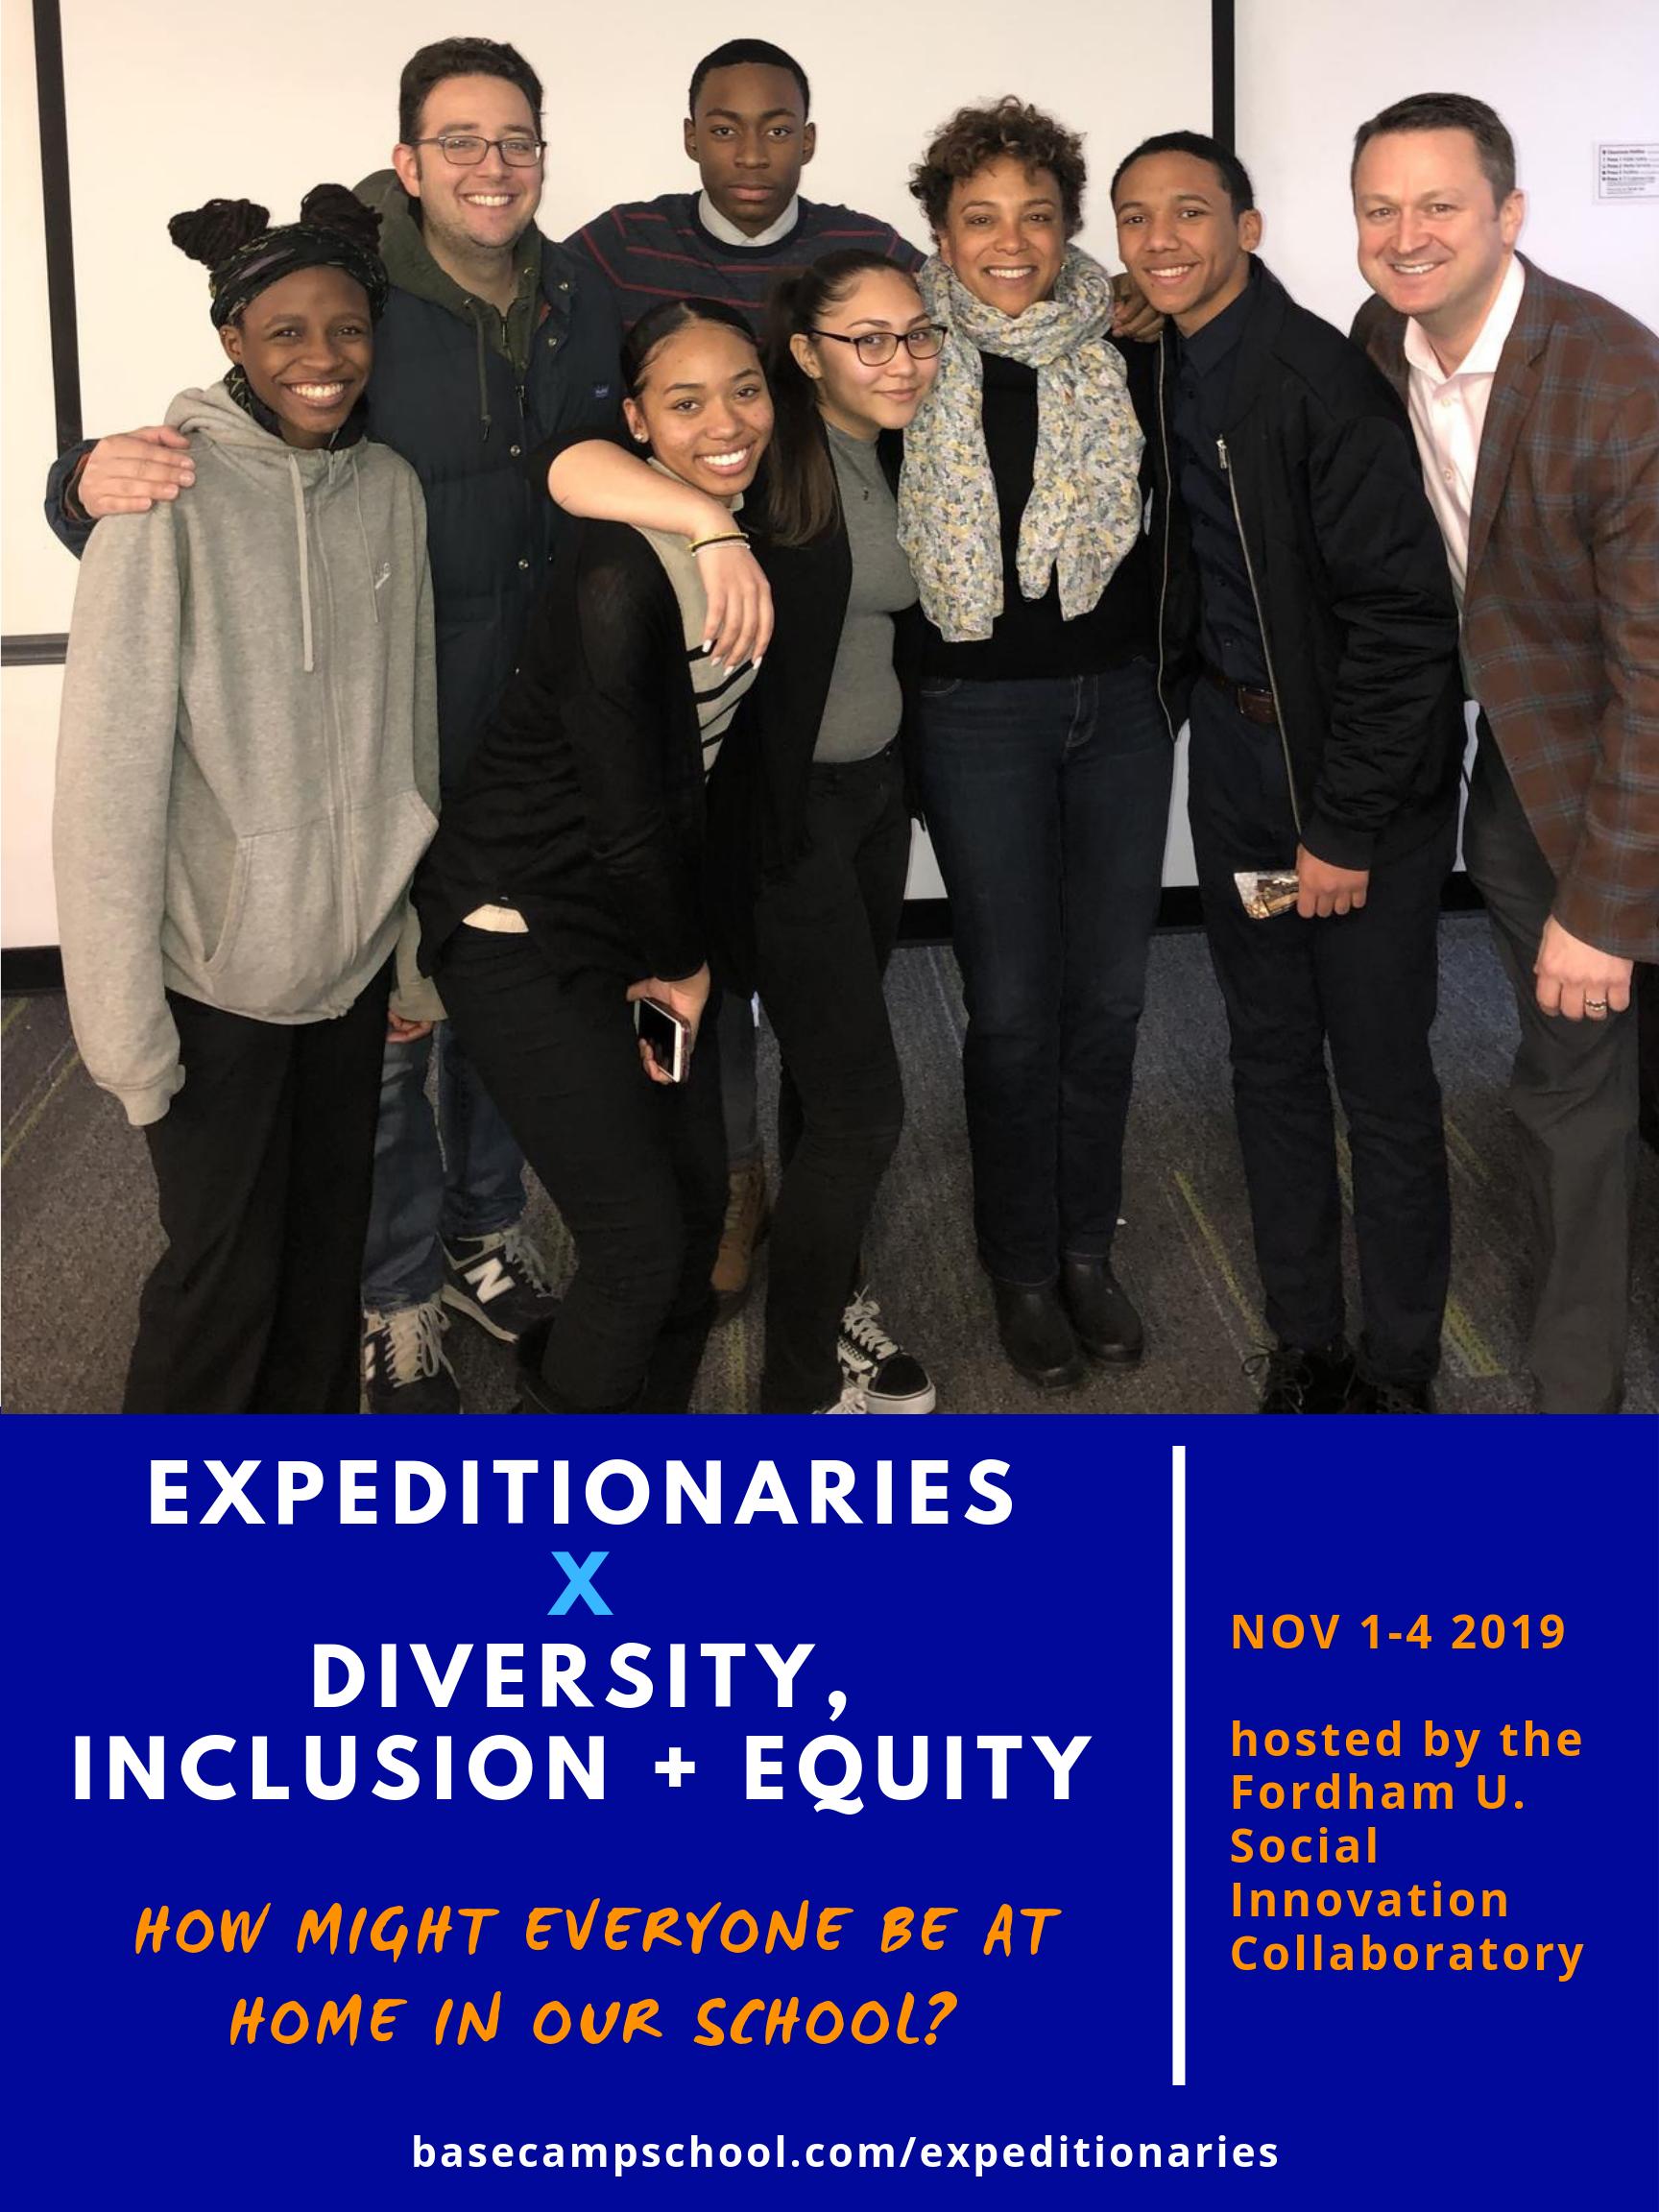 EXP x Diversity Inclusion Equity Nov 2019.png